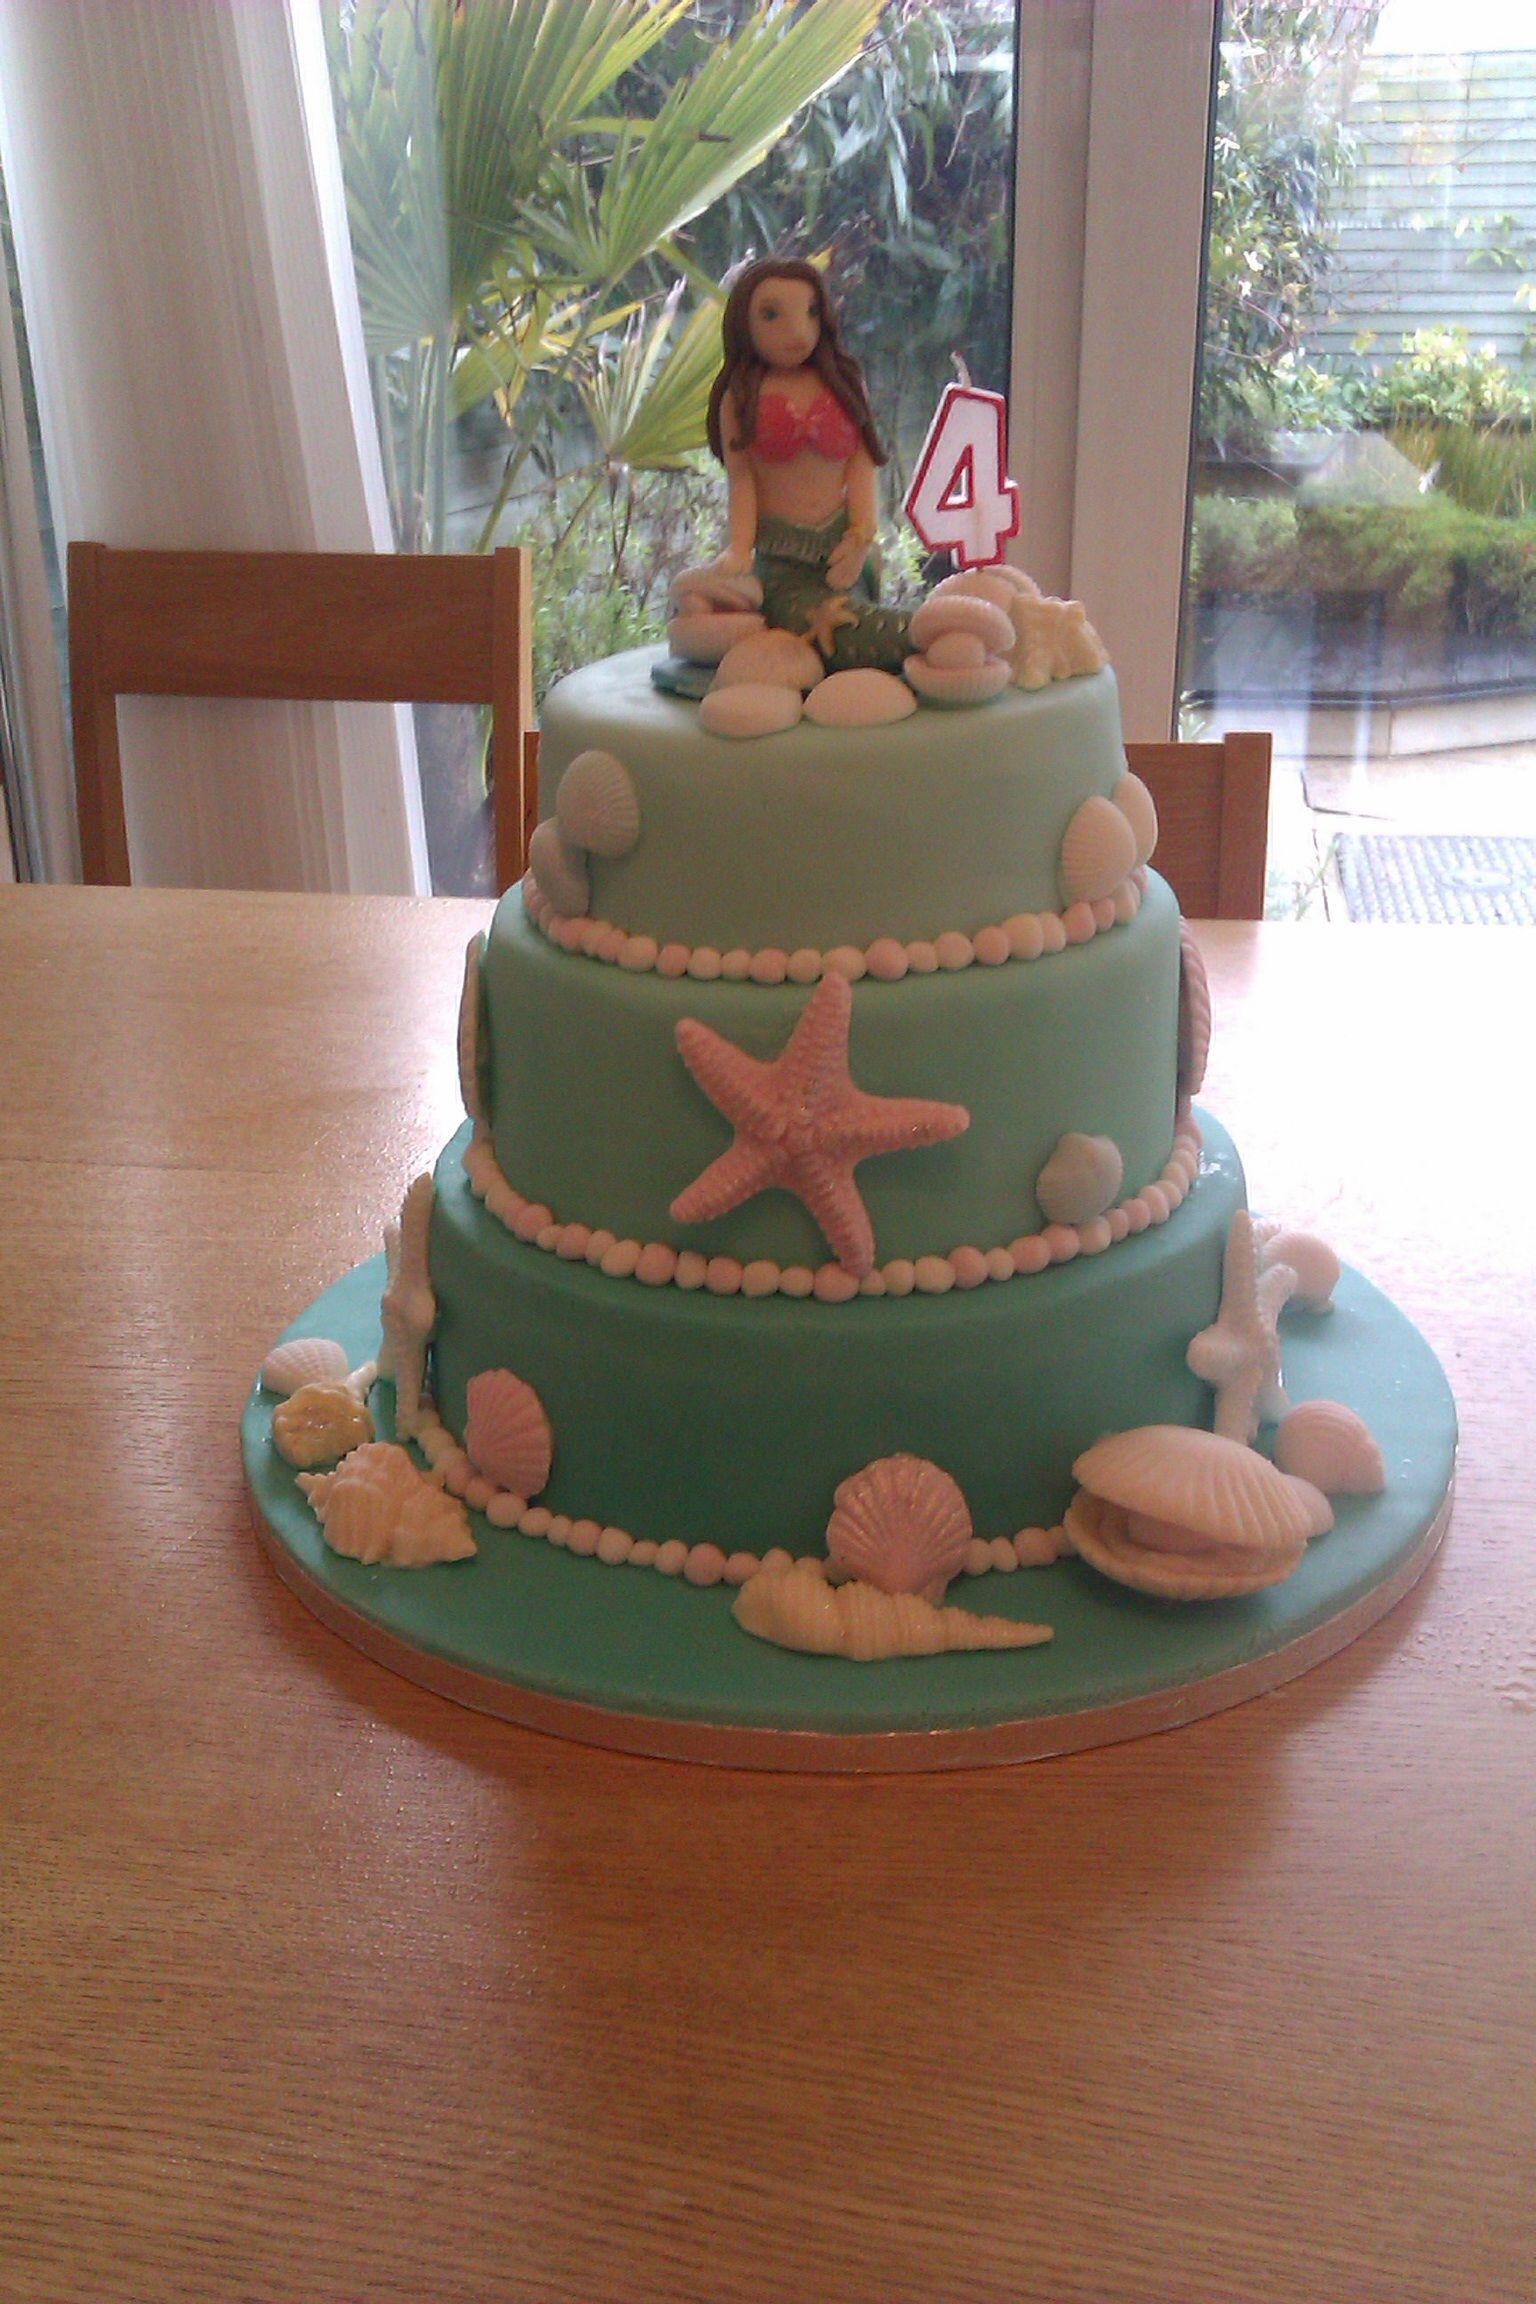 My Little Girls 4th Birthday Cake Madeira Cake With Strawberry